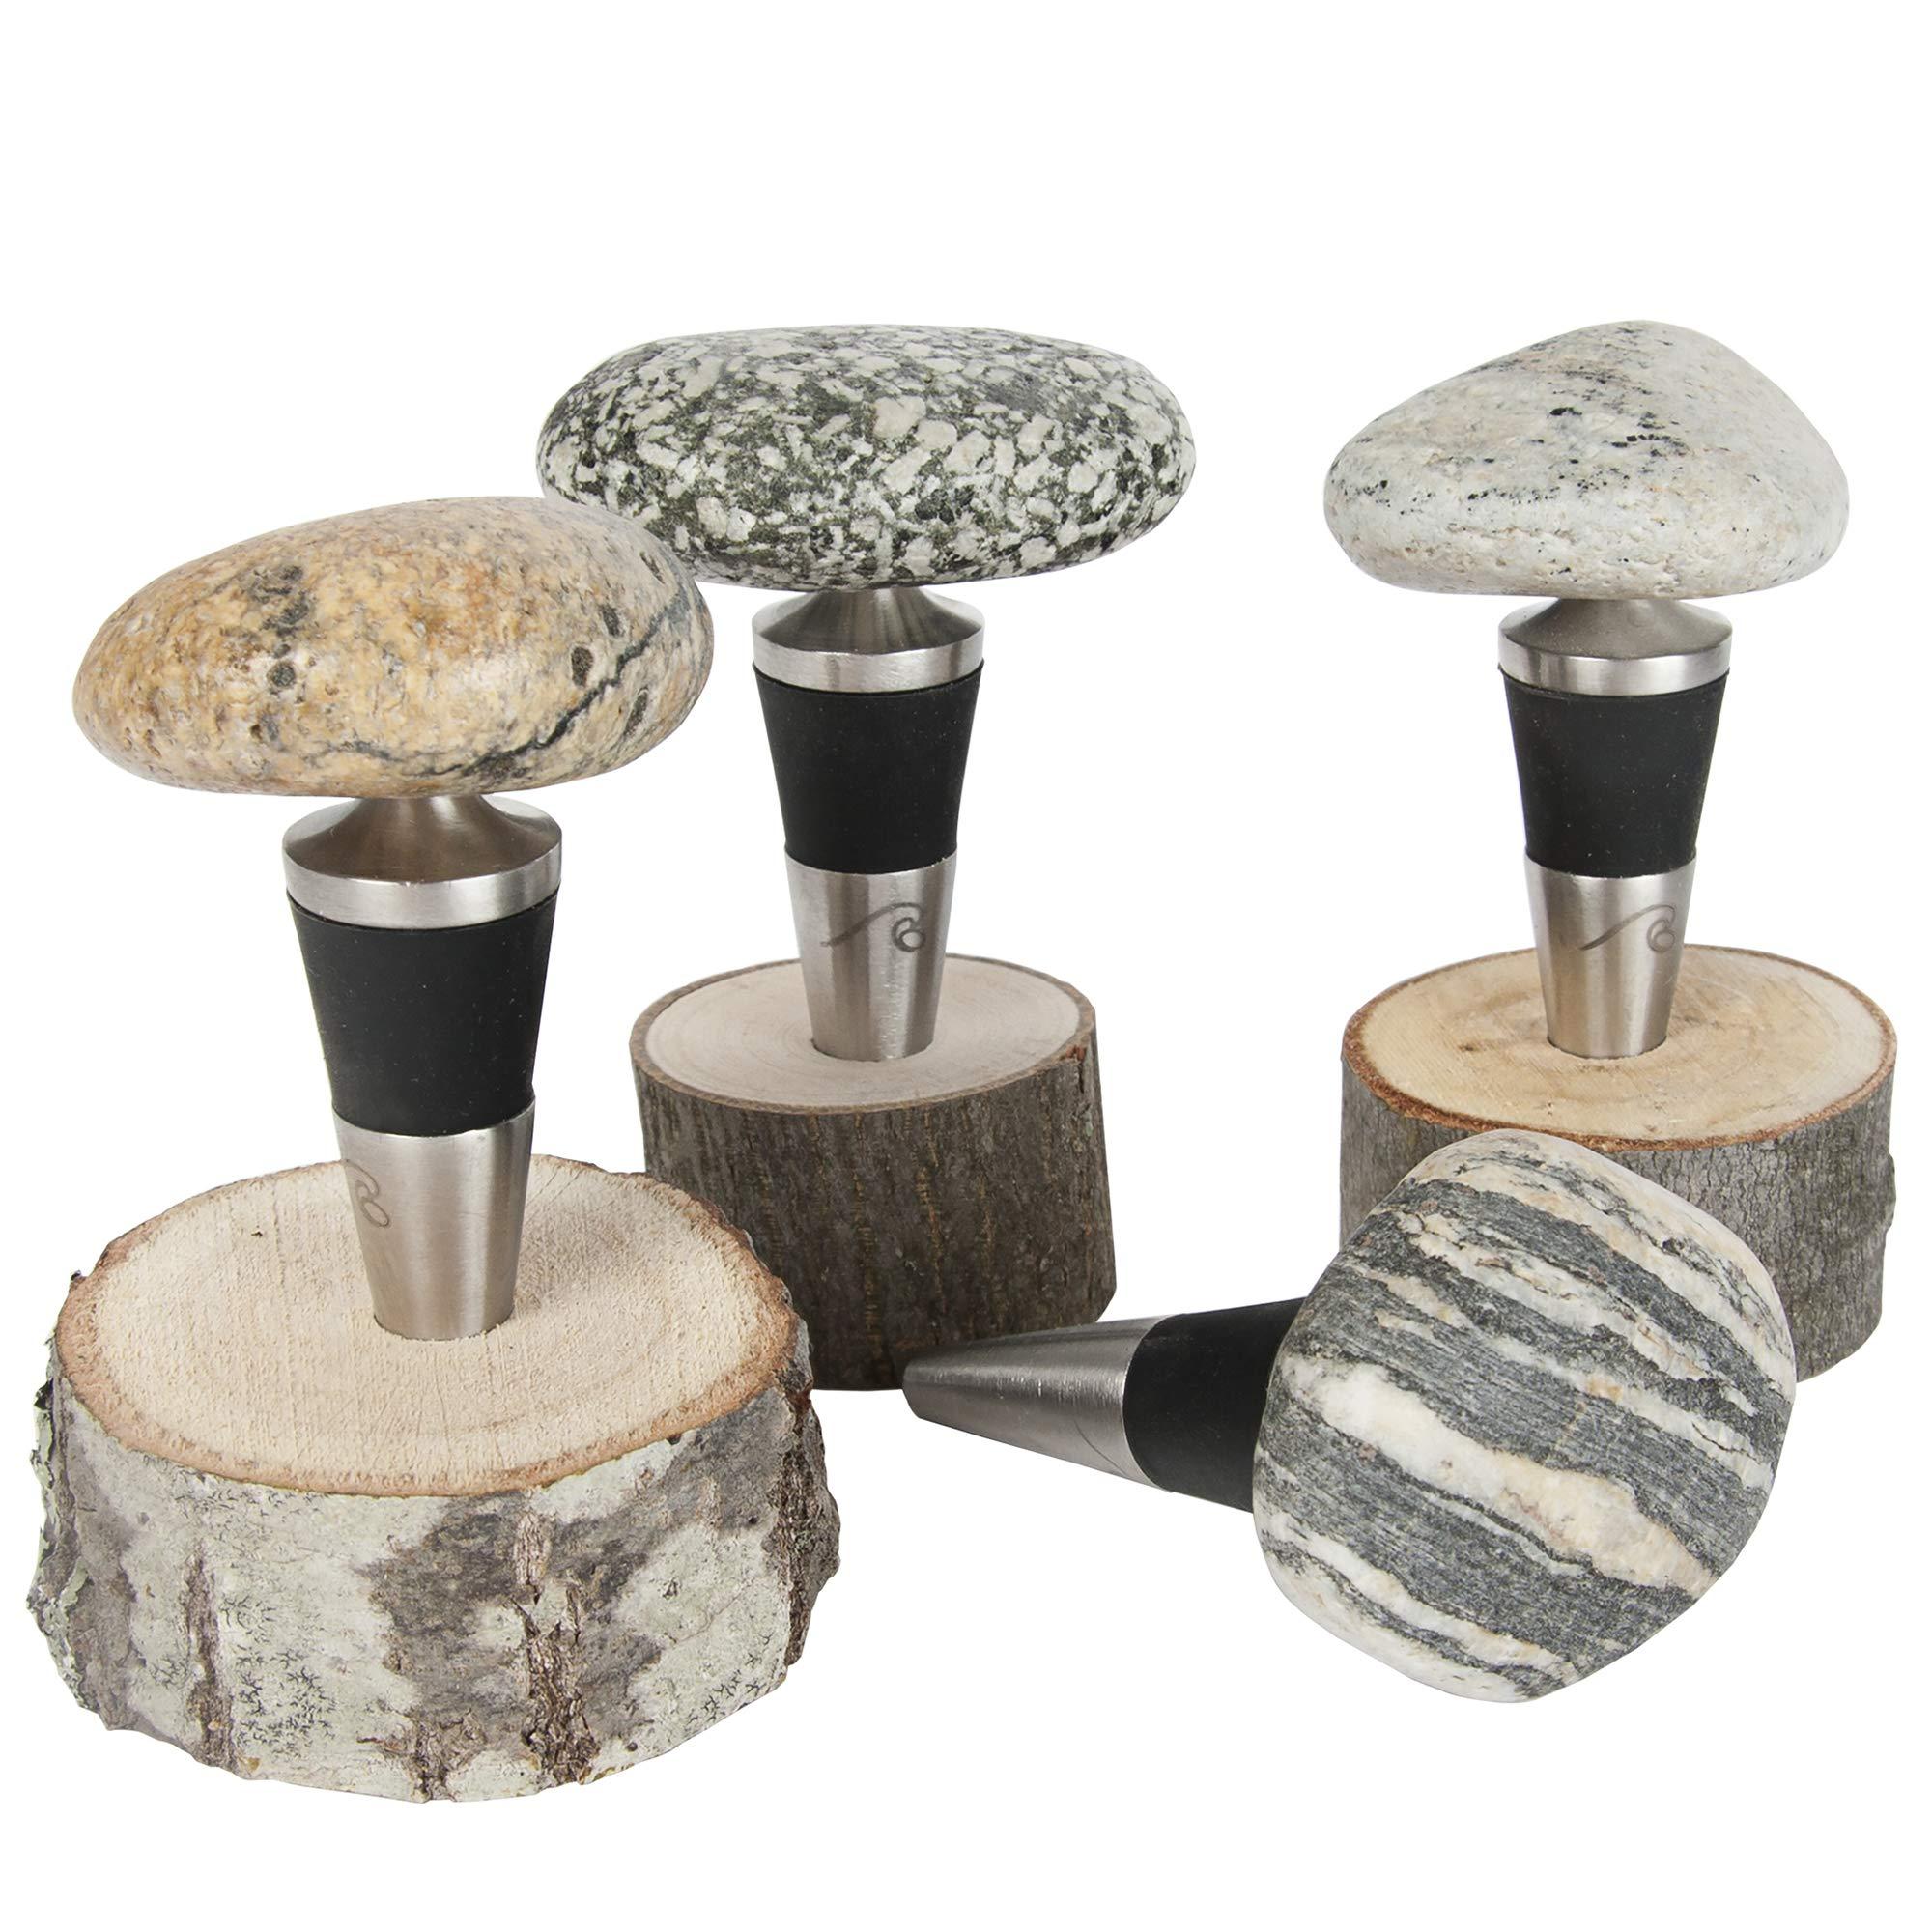 Sea Stones Artisanal Steel Cone Wine Bottle, Liquor Bottle and Olive Oil Stopper with Natural Hardwood Base